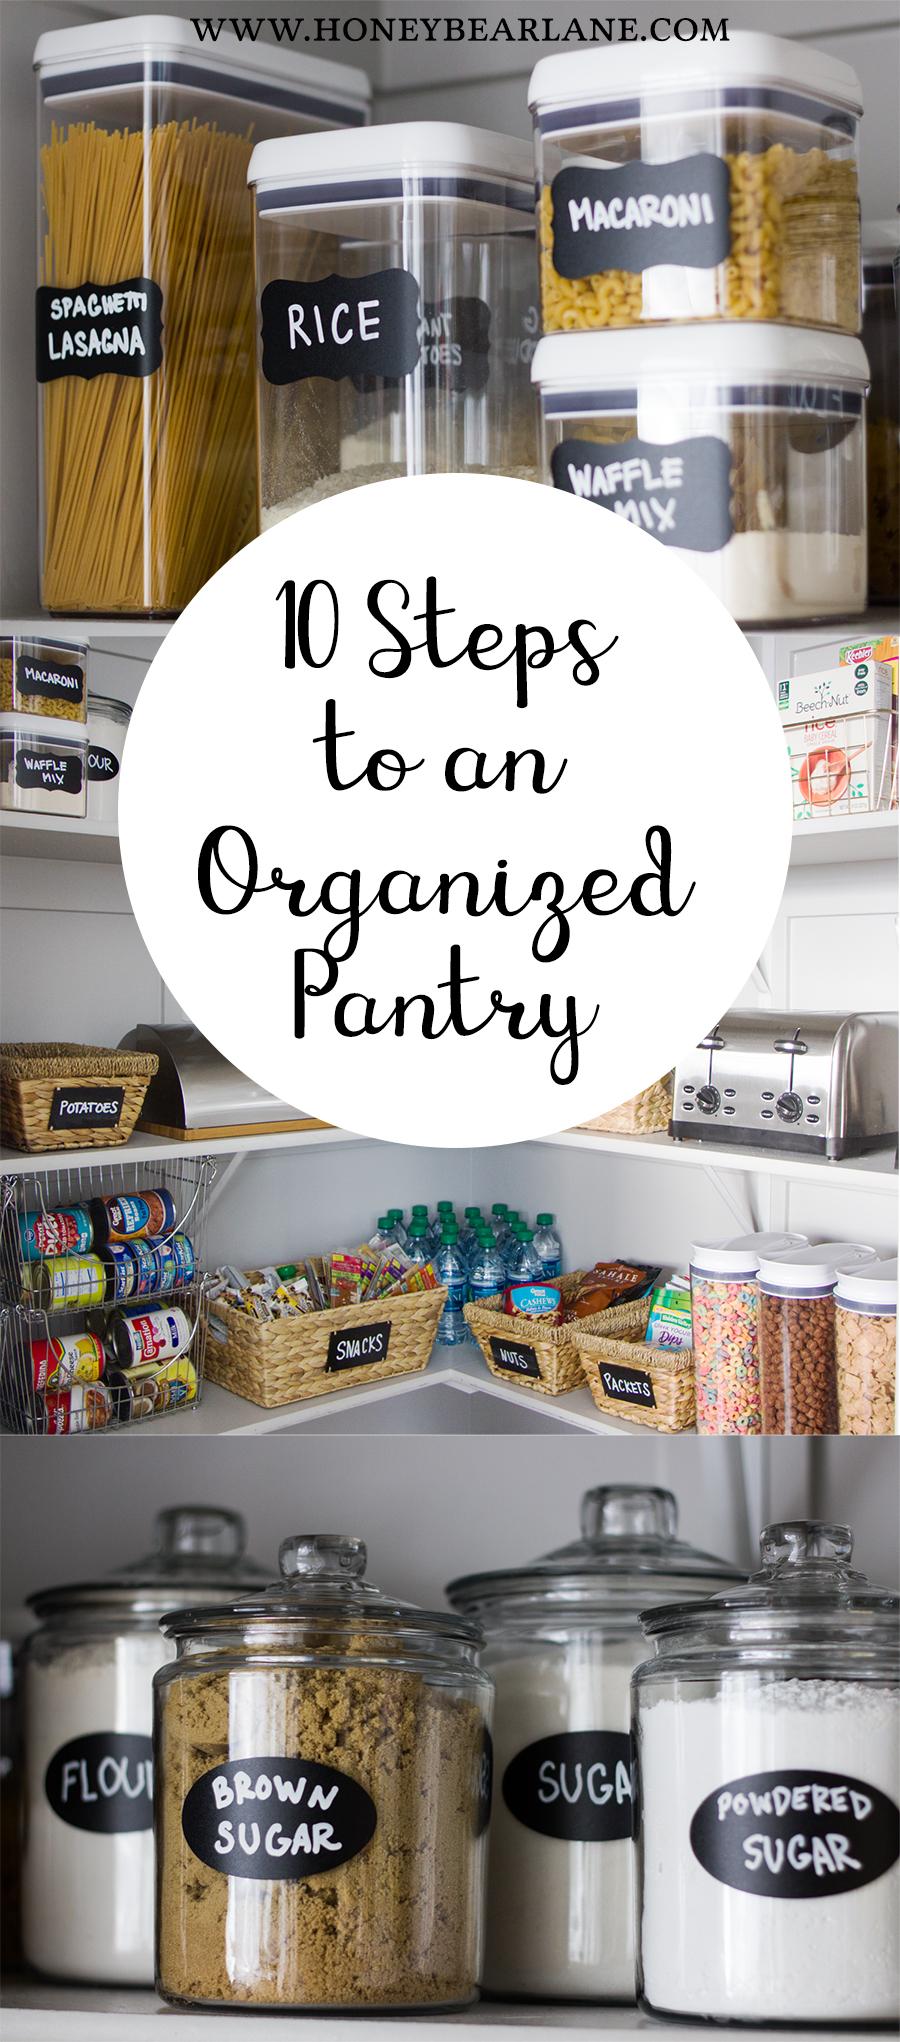 10 steps to an organized pantry - honeybear lane